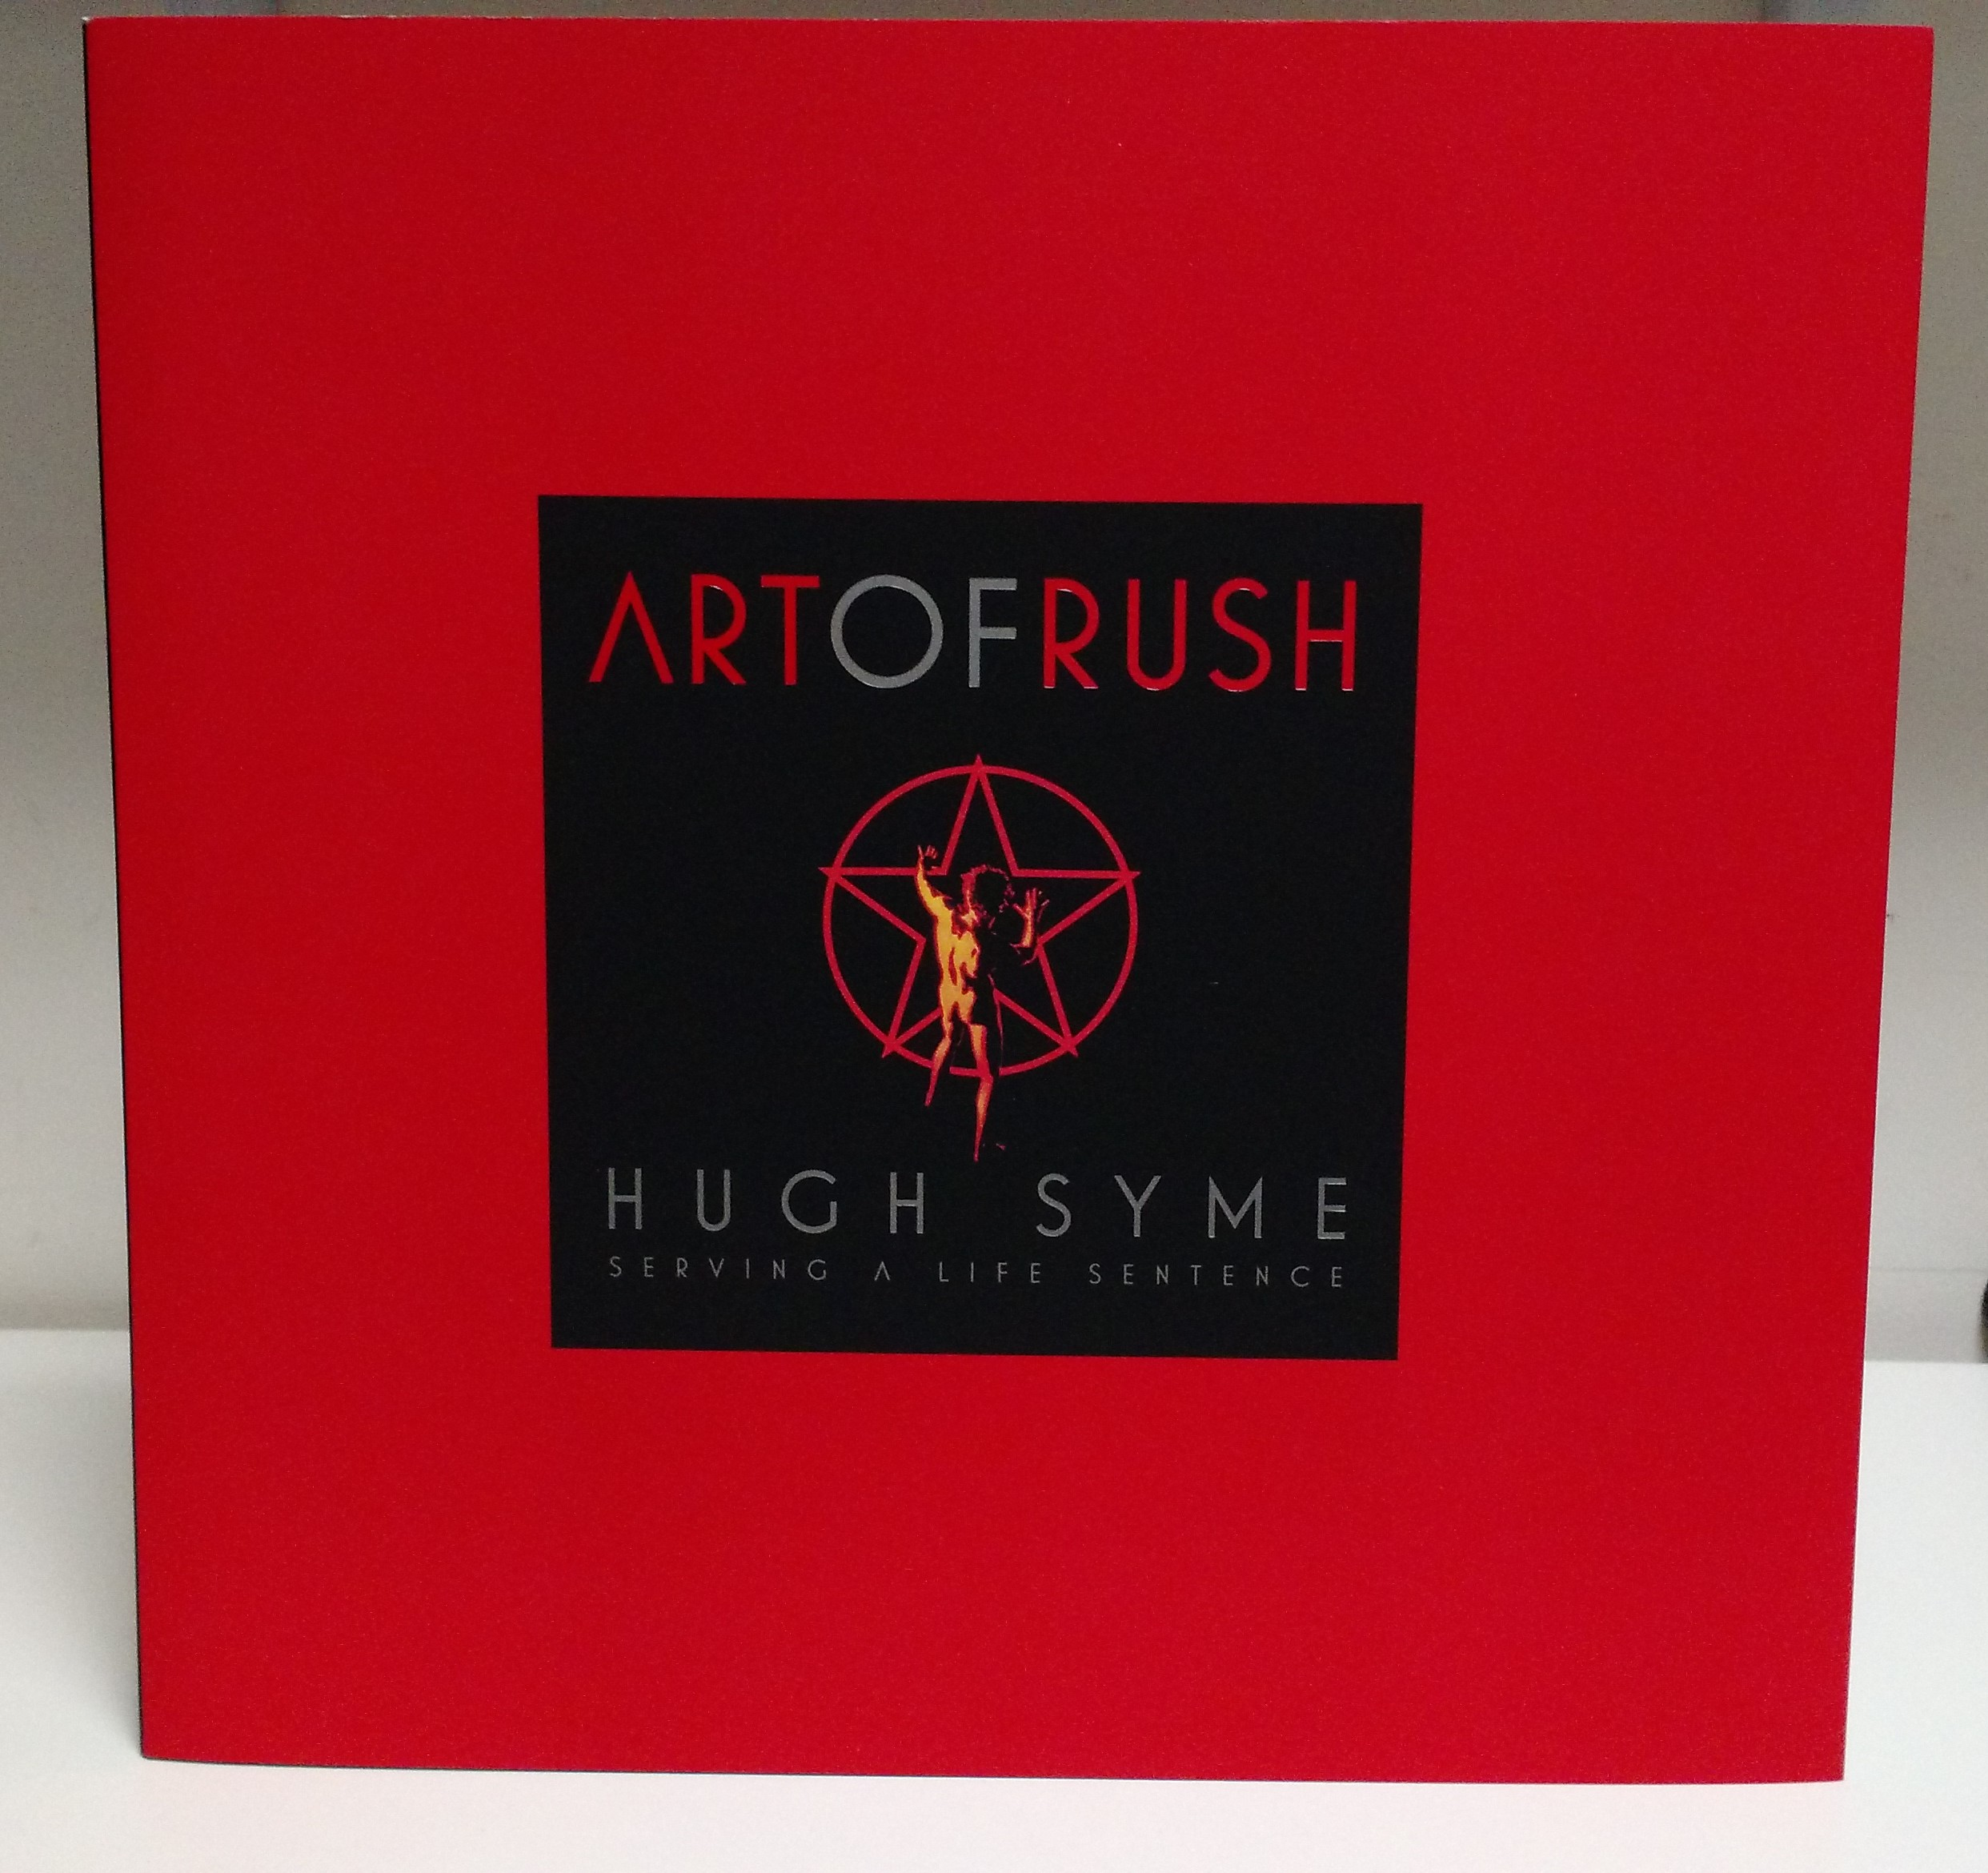 The Art of Rush: Hugh Syme Serving a Life Sentence